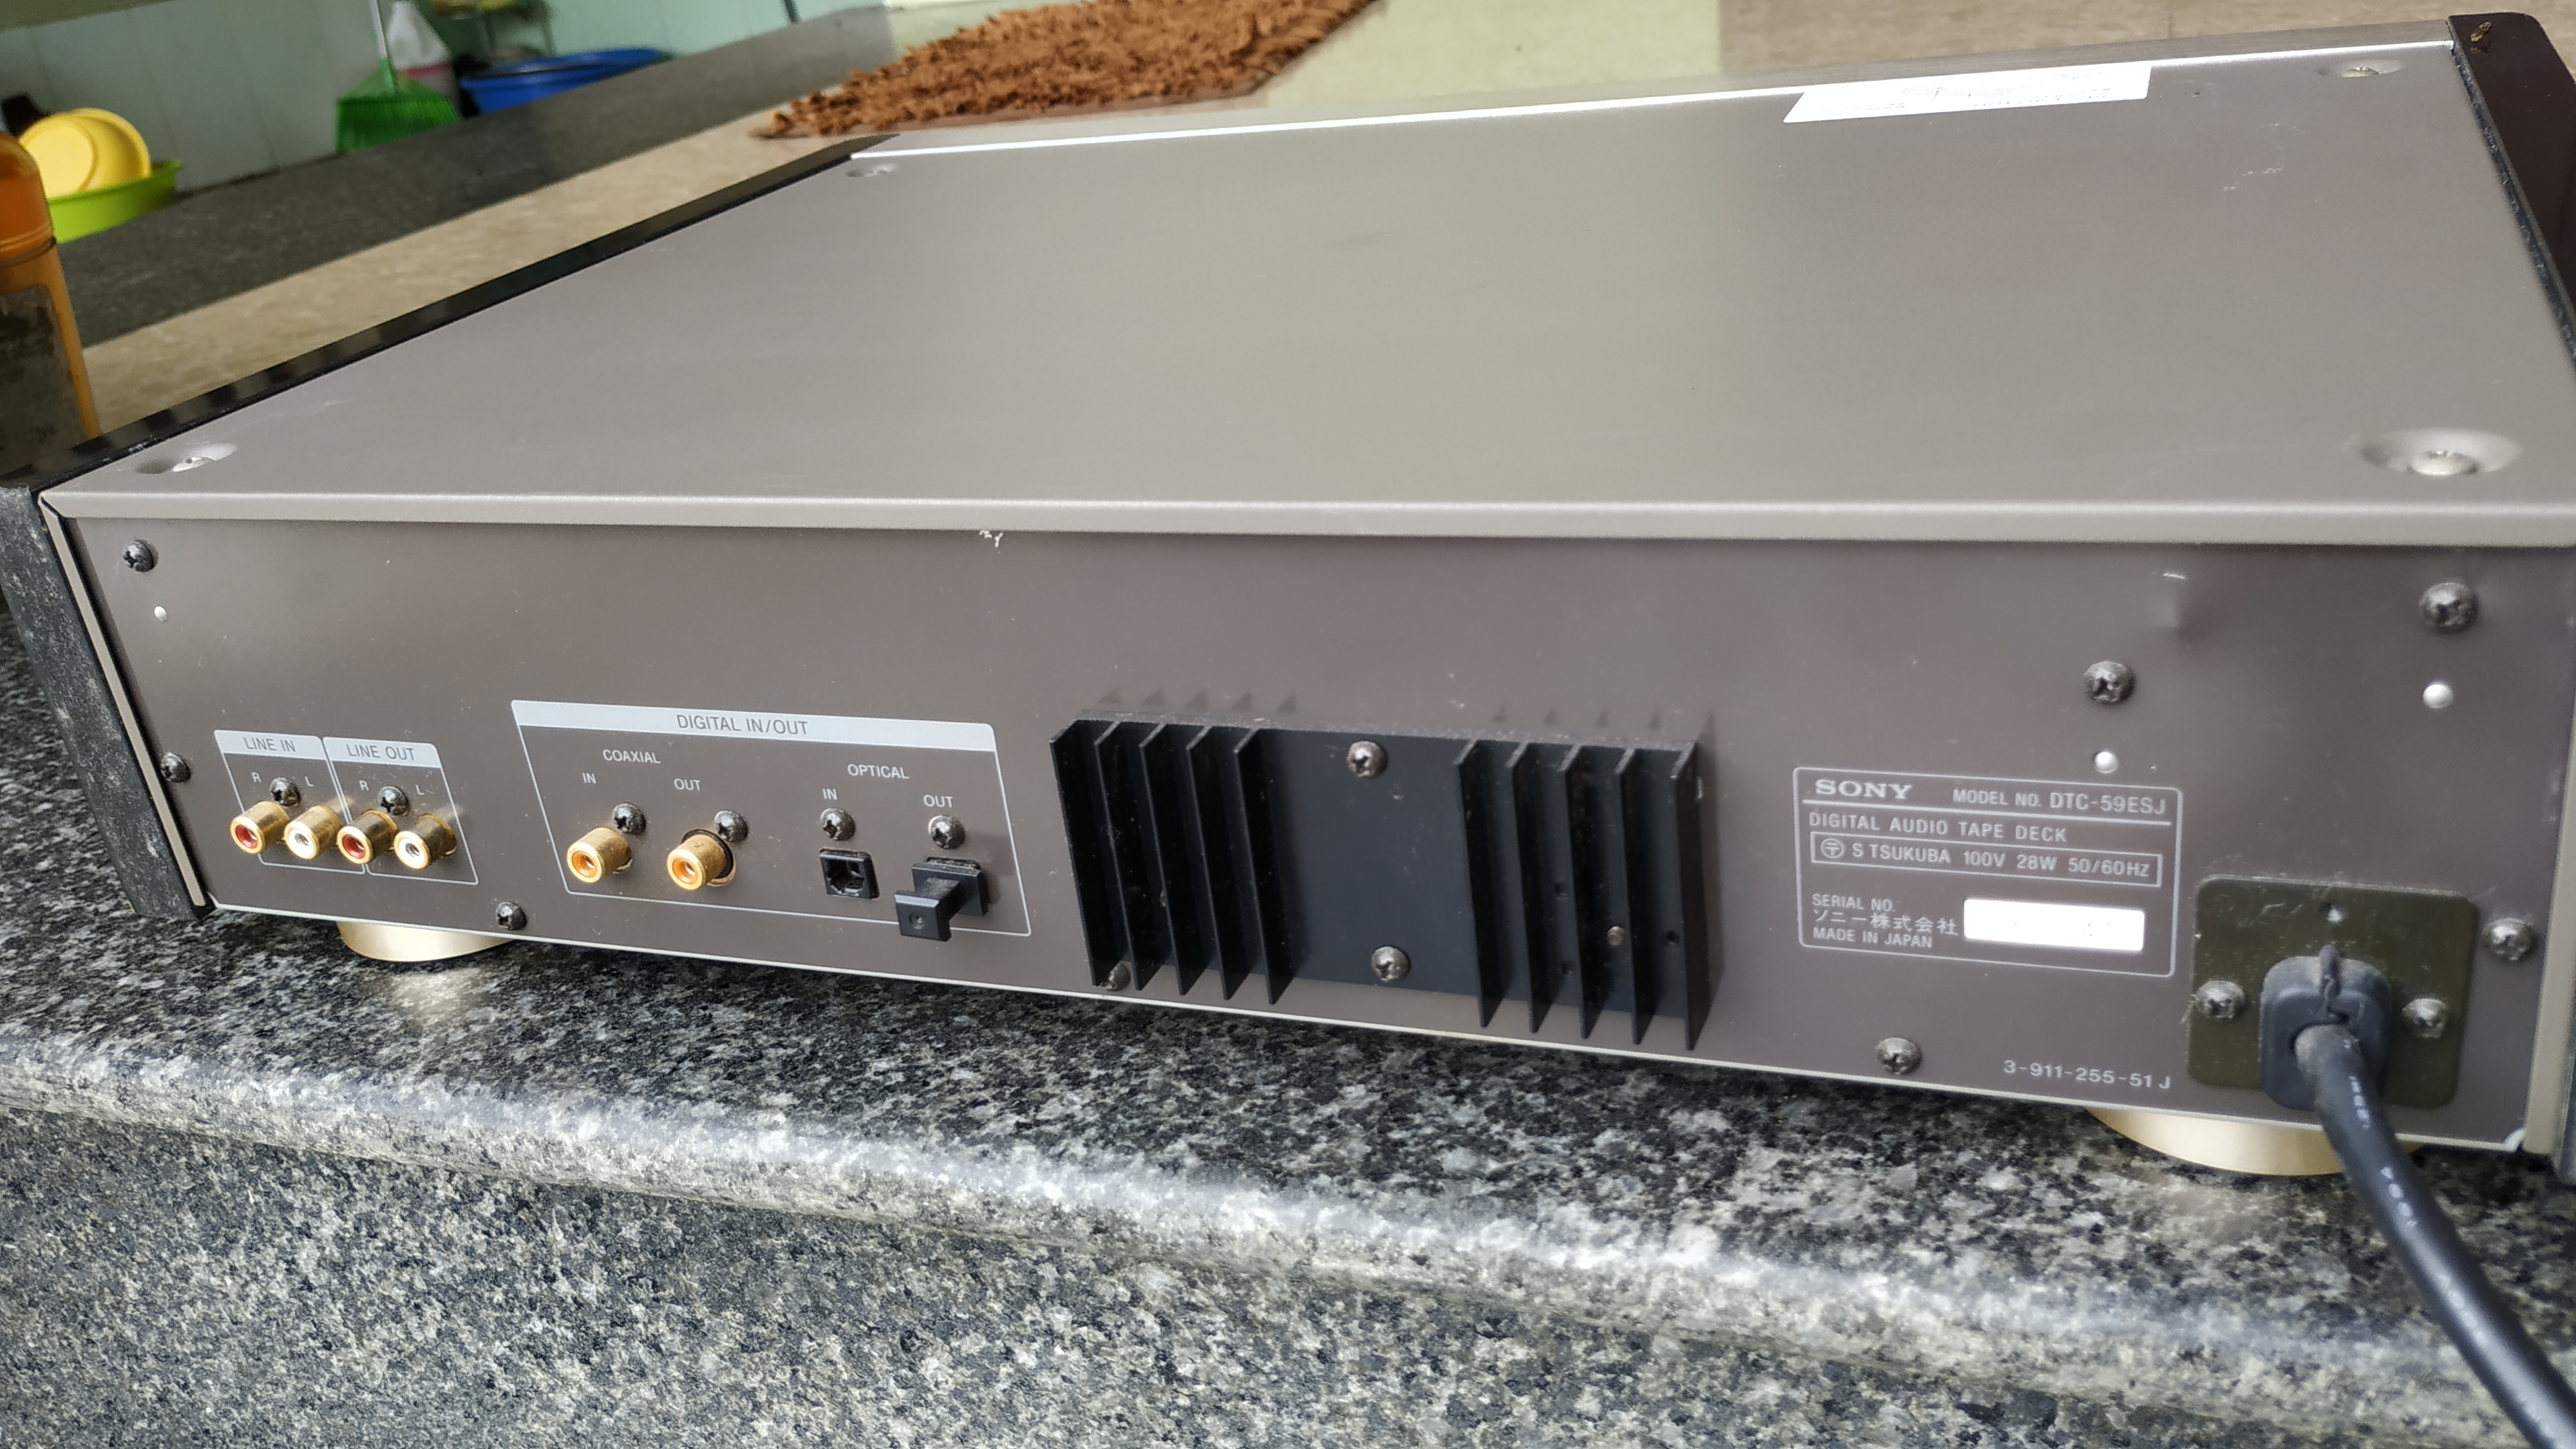 5 Đầu CD sony x777es DAT sony 59esj amly pioneer 8800ii